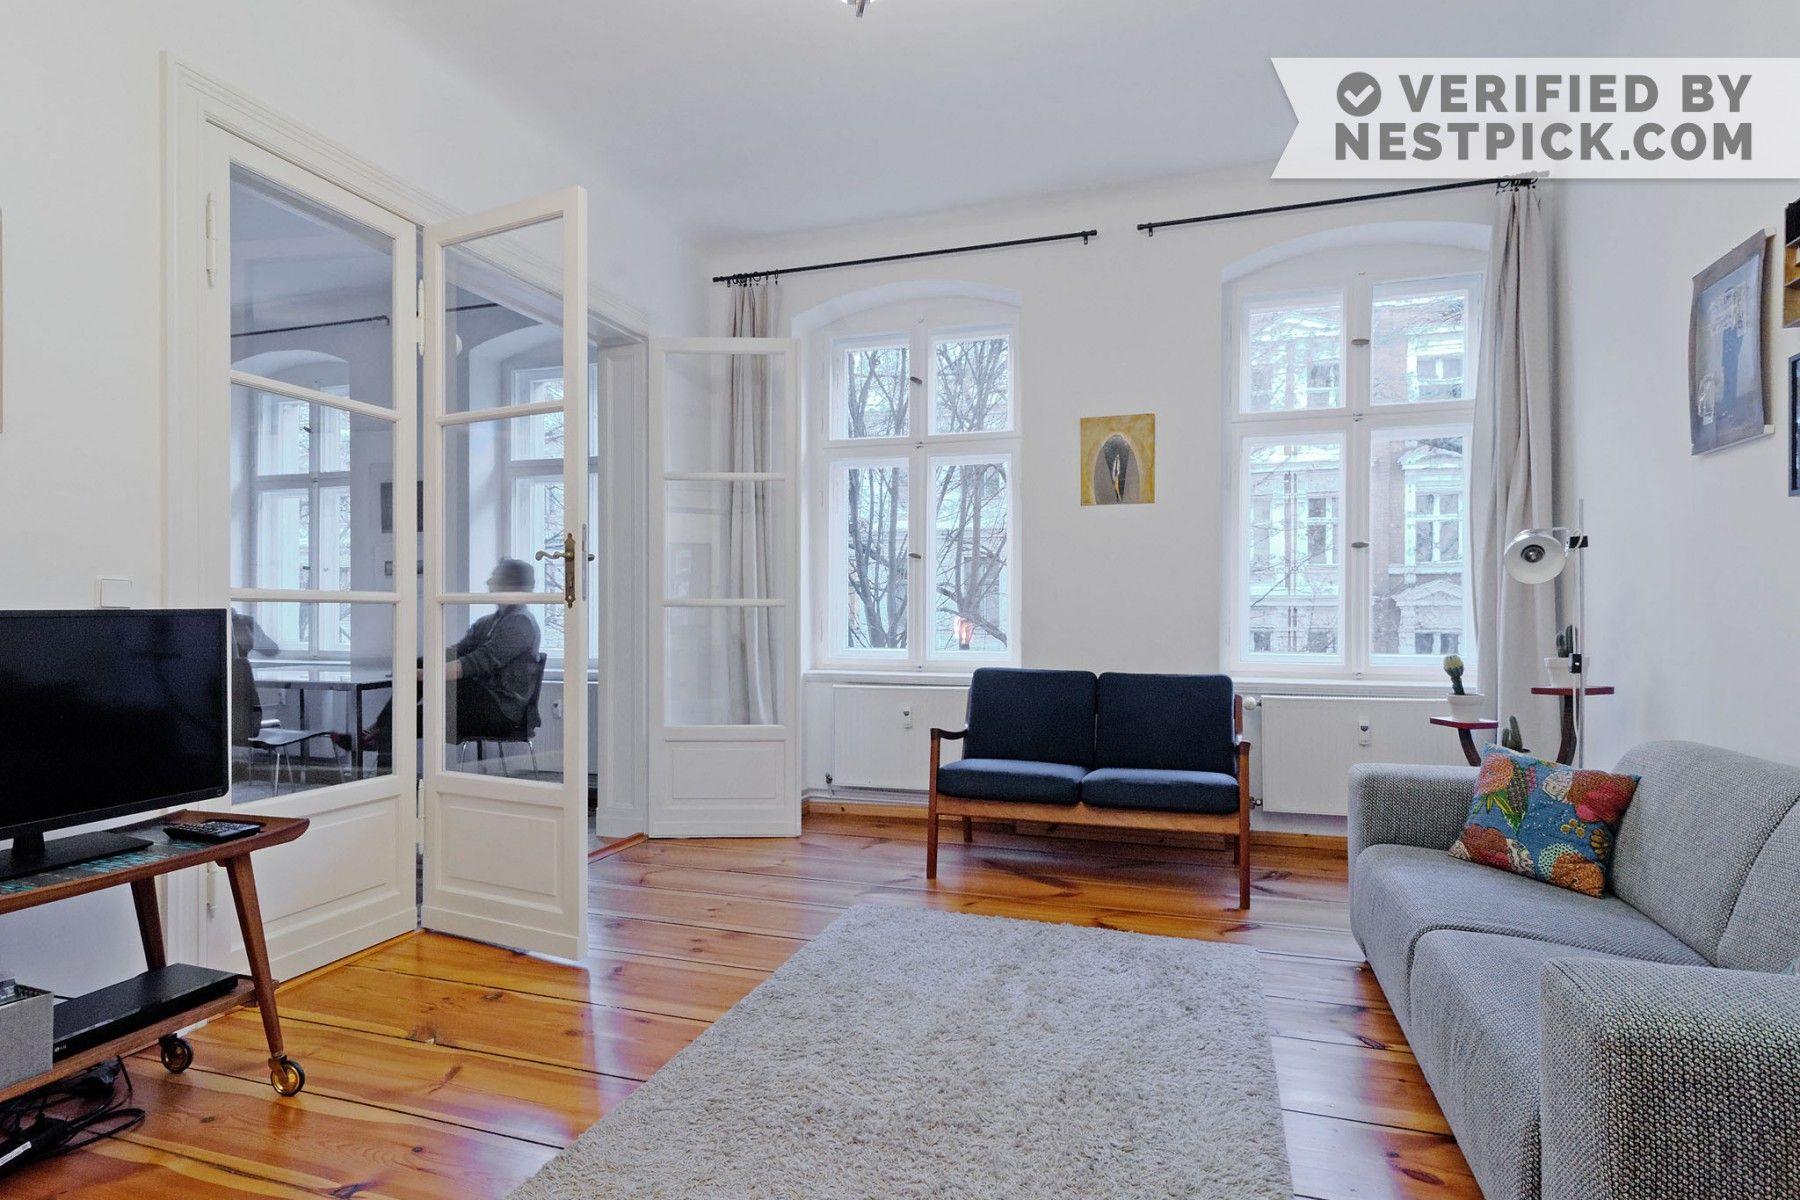 Apartment Einrichtung stylish 2 bedroom apartment in kreuzberg berlin möbel